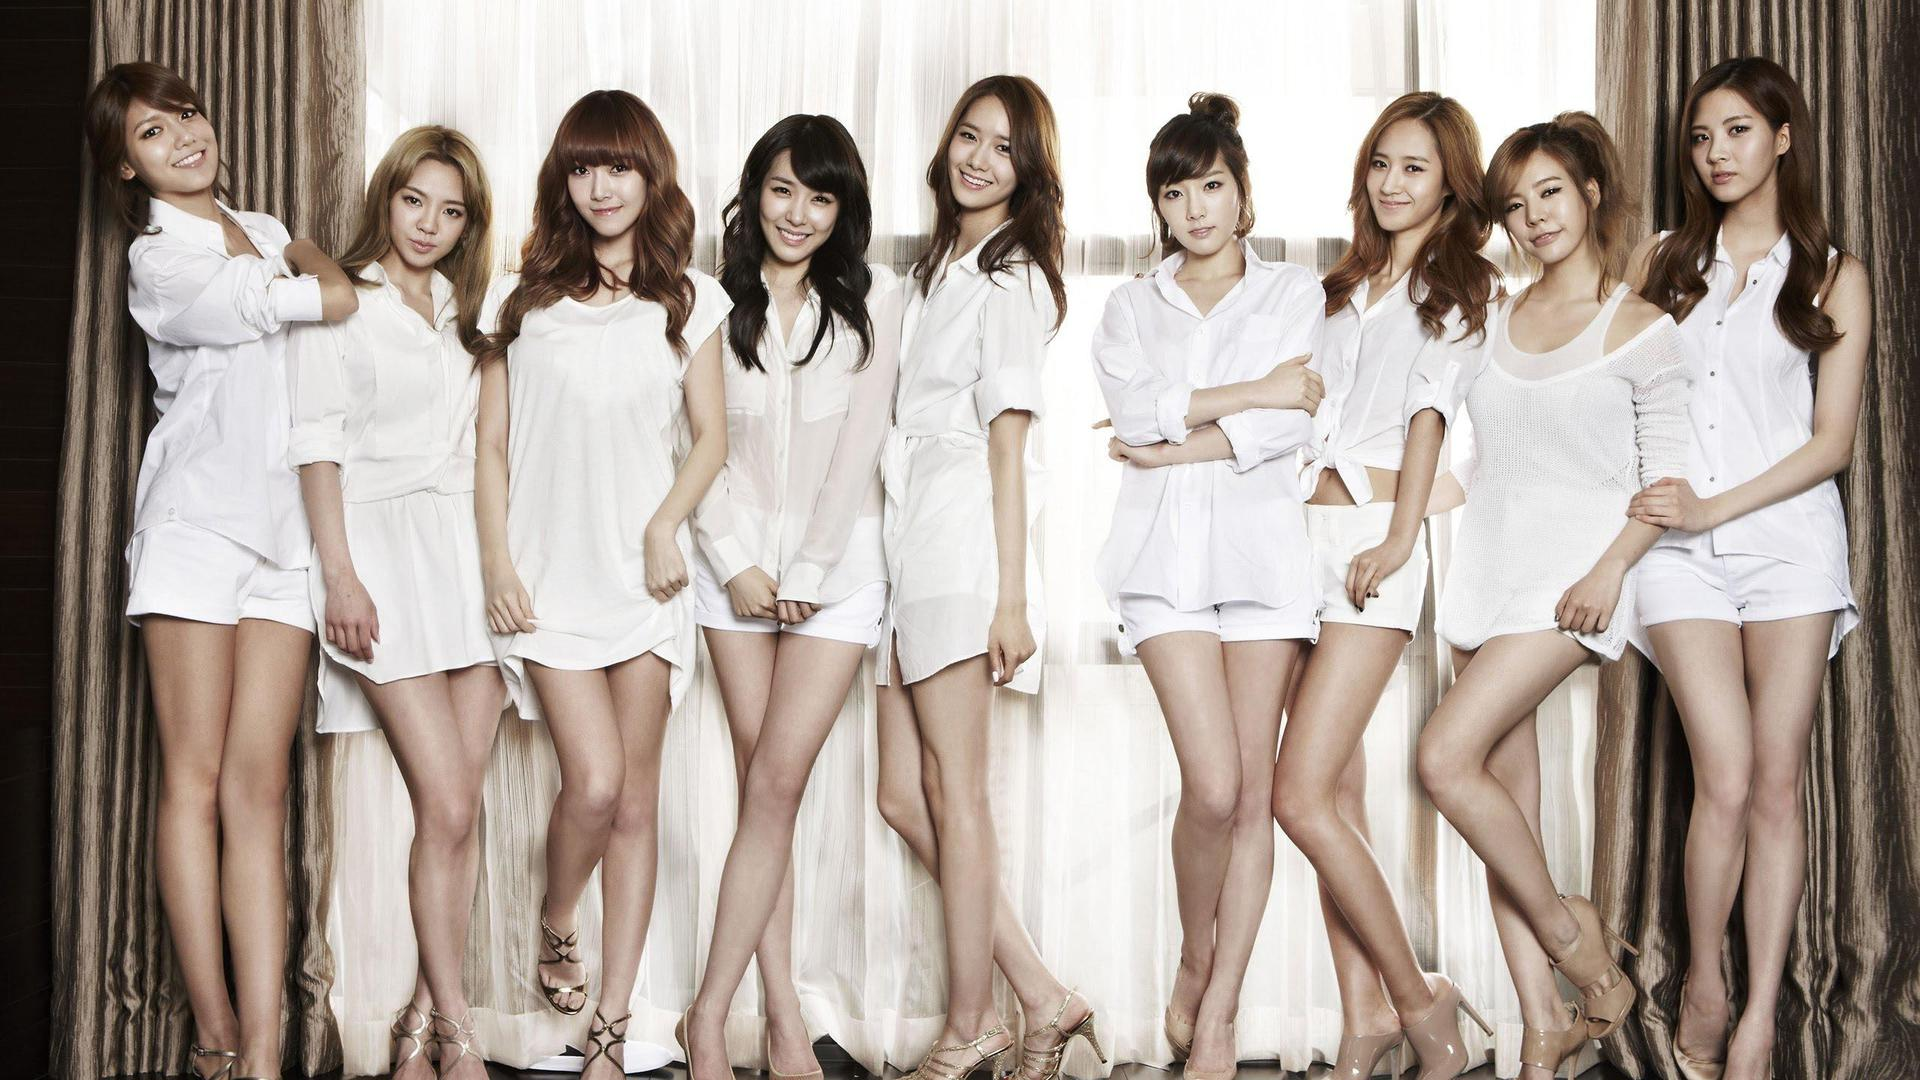 SM ลั่นพร้อมประกาศวันคัมแบ็ค Girls' Generation สัปดาห์หน้า